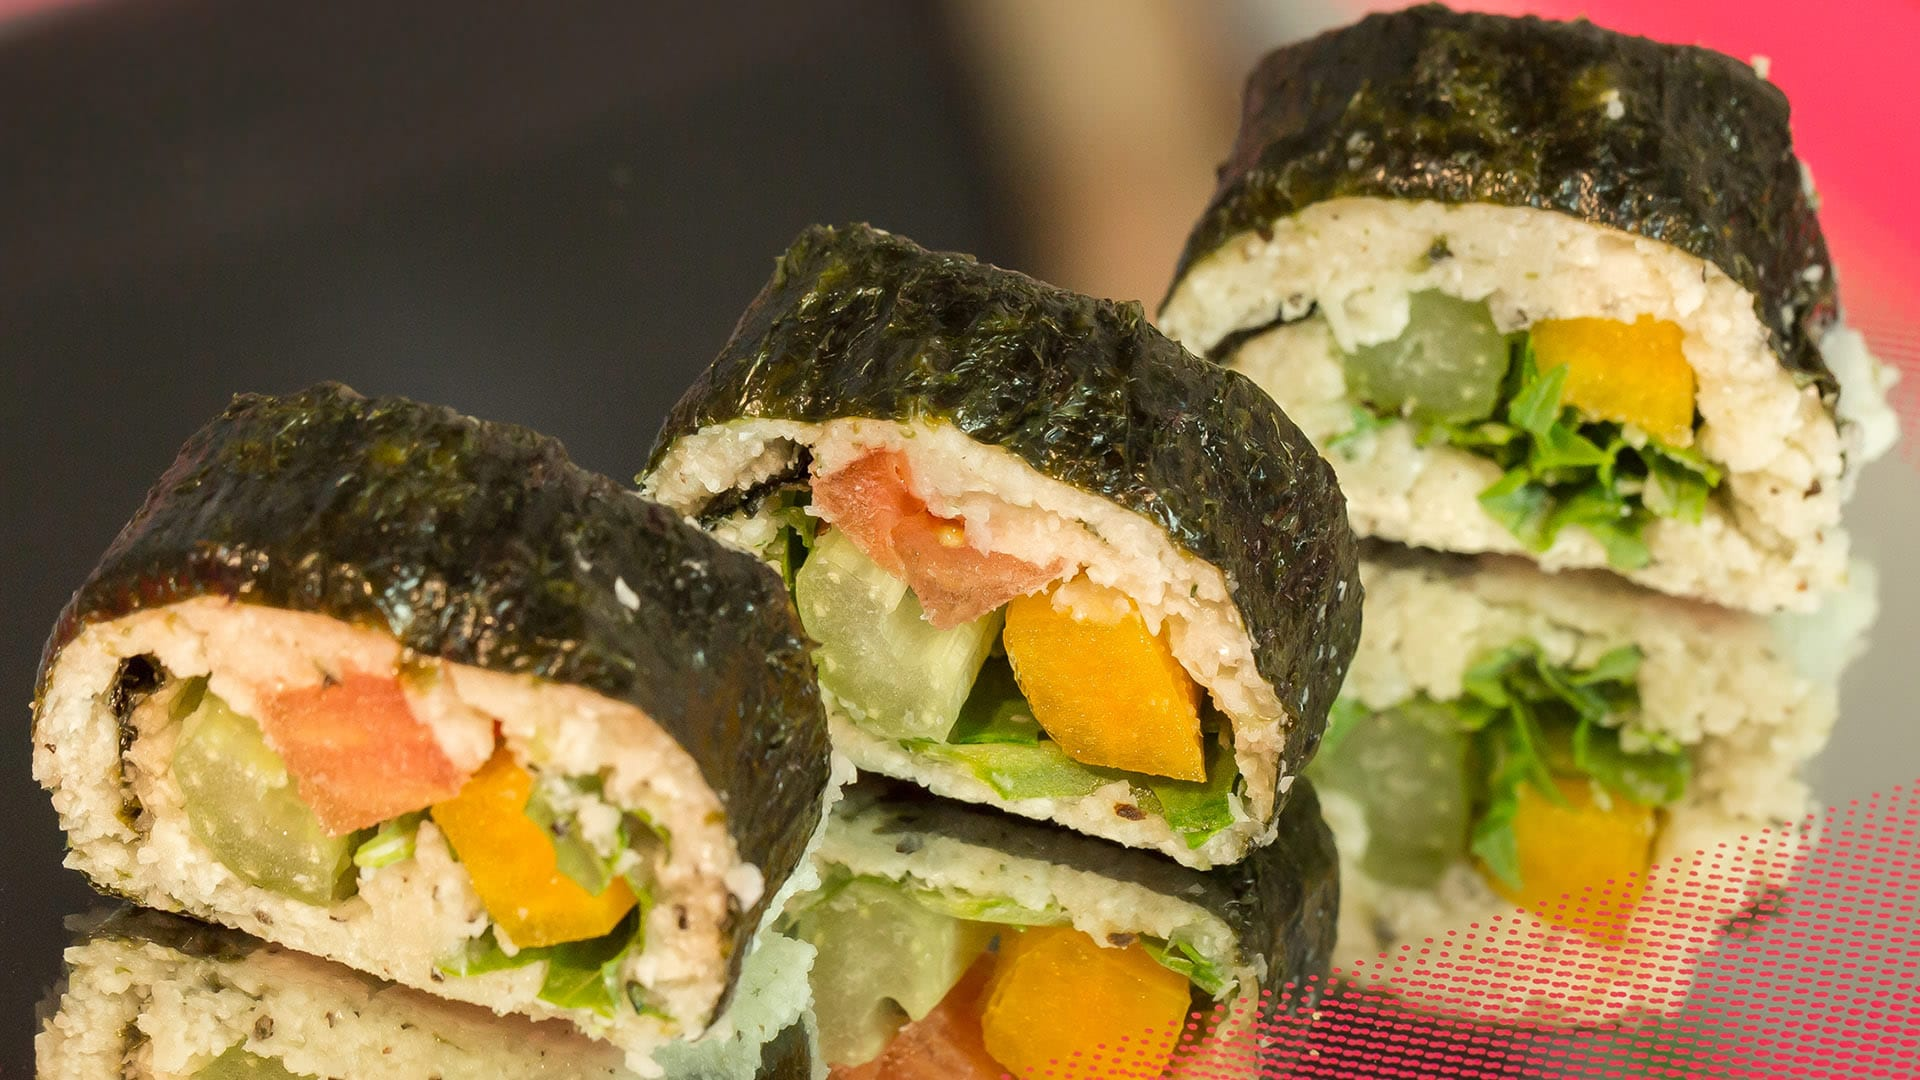 Foto Futomaki-Sushi Crudista Vegano